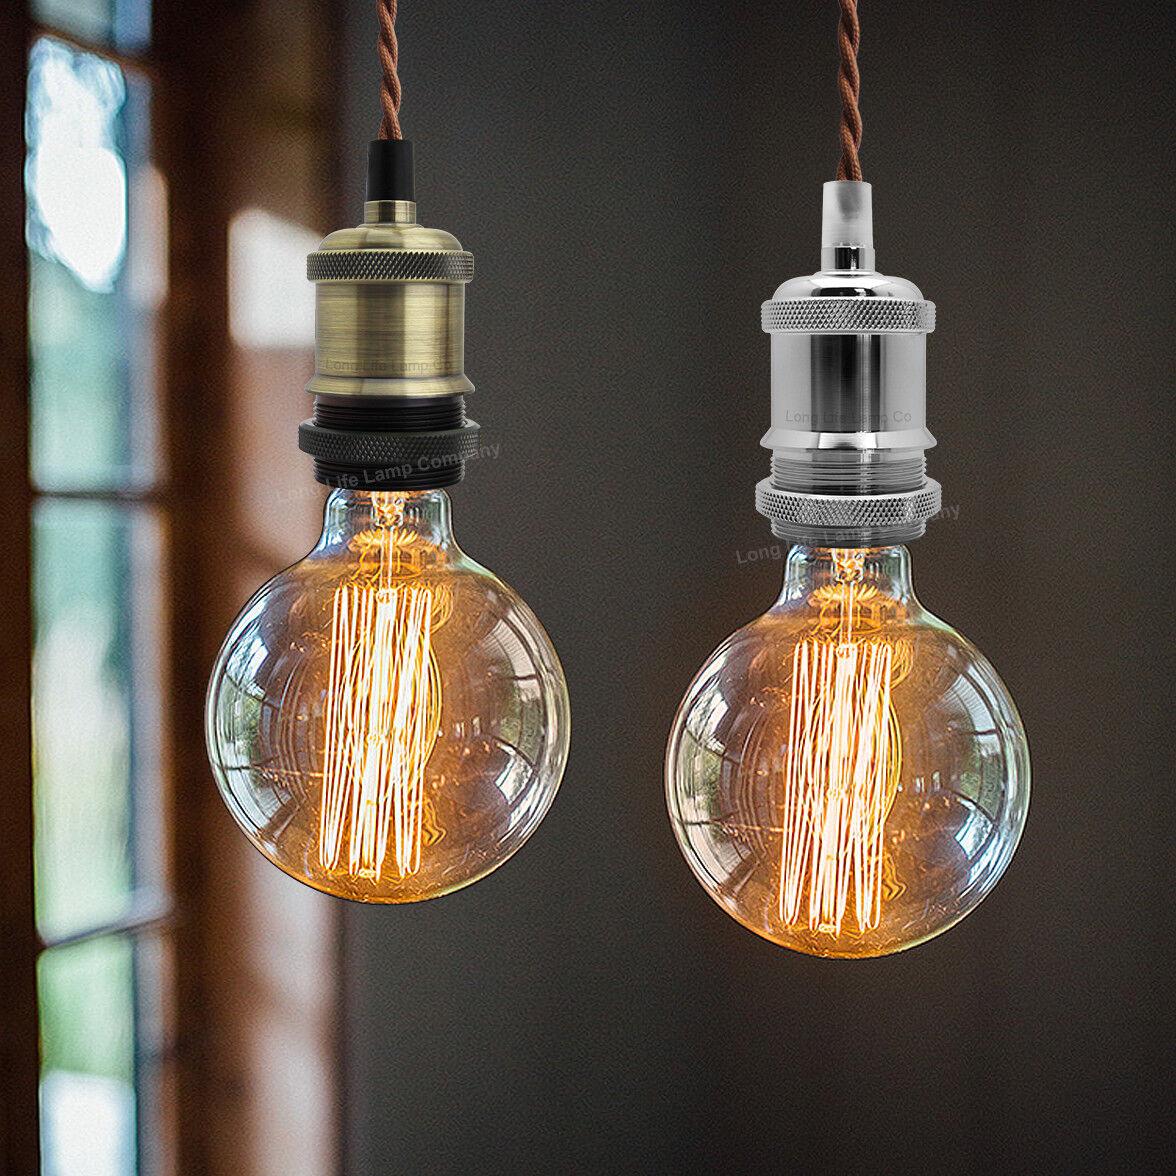 Ceiling Rose Fabric Flex Hanging Pendant Lamp Holder Light